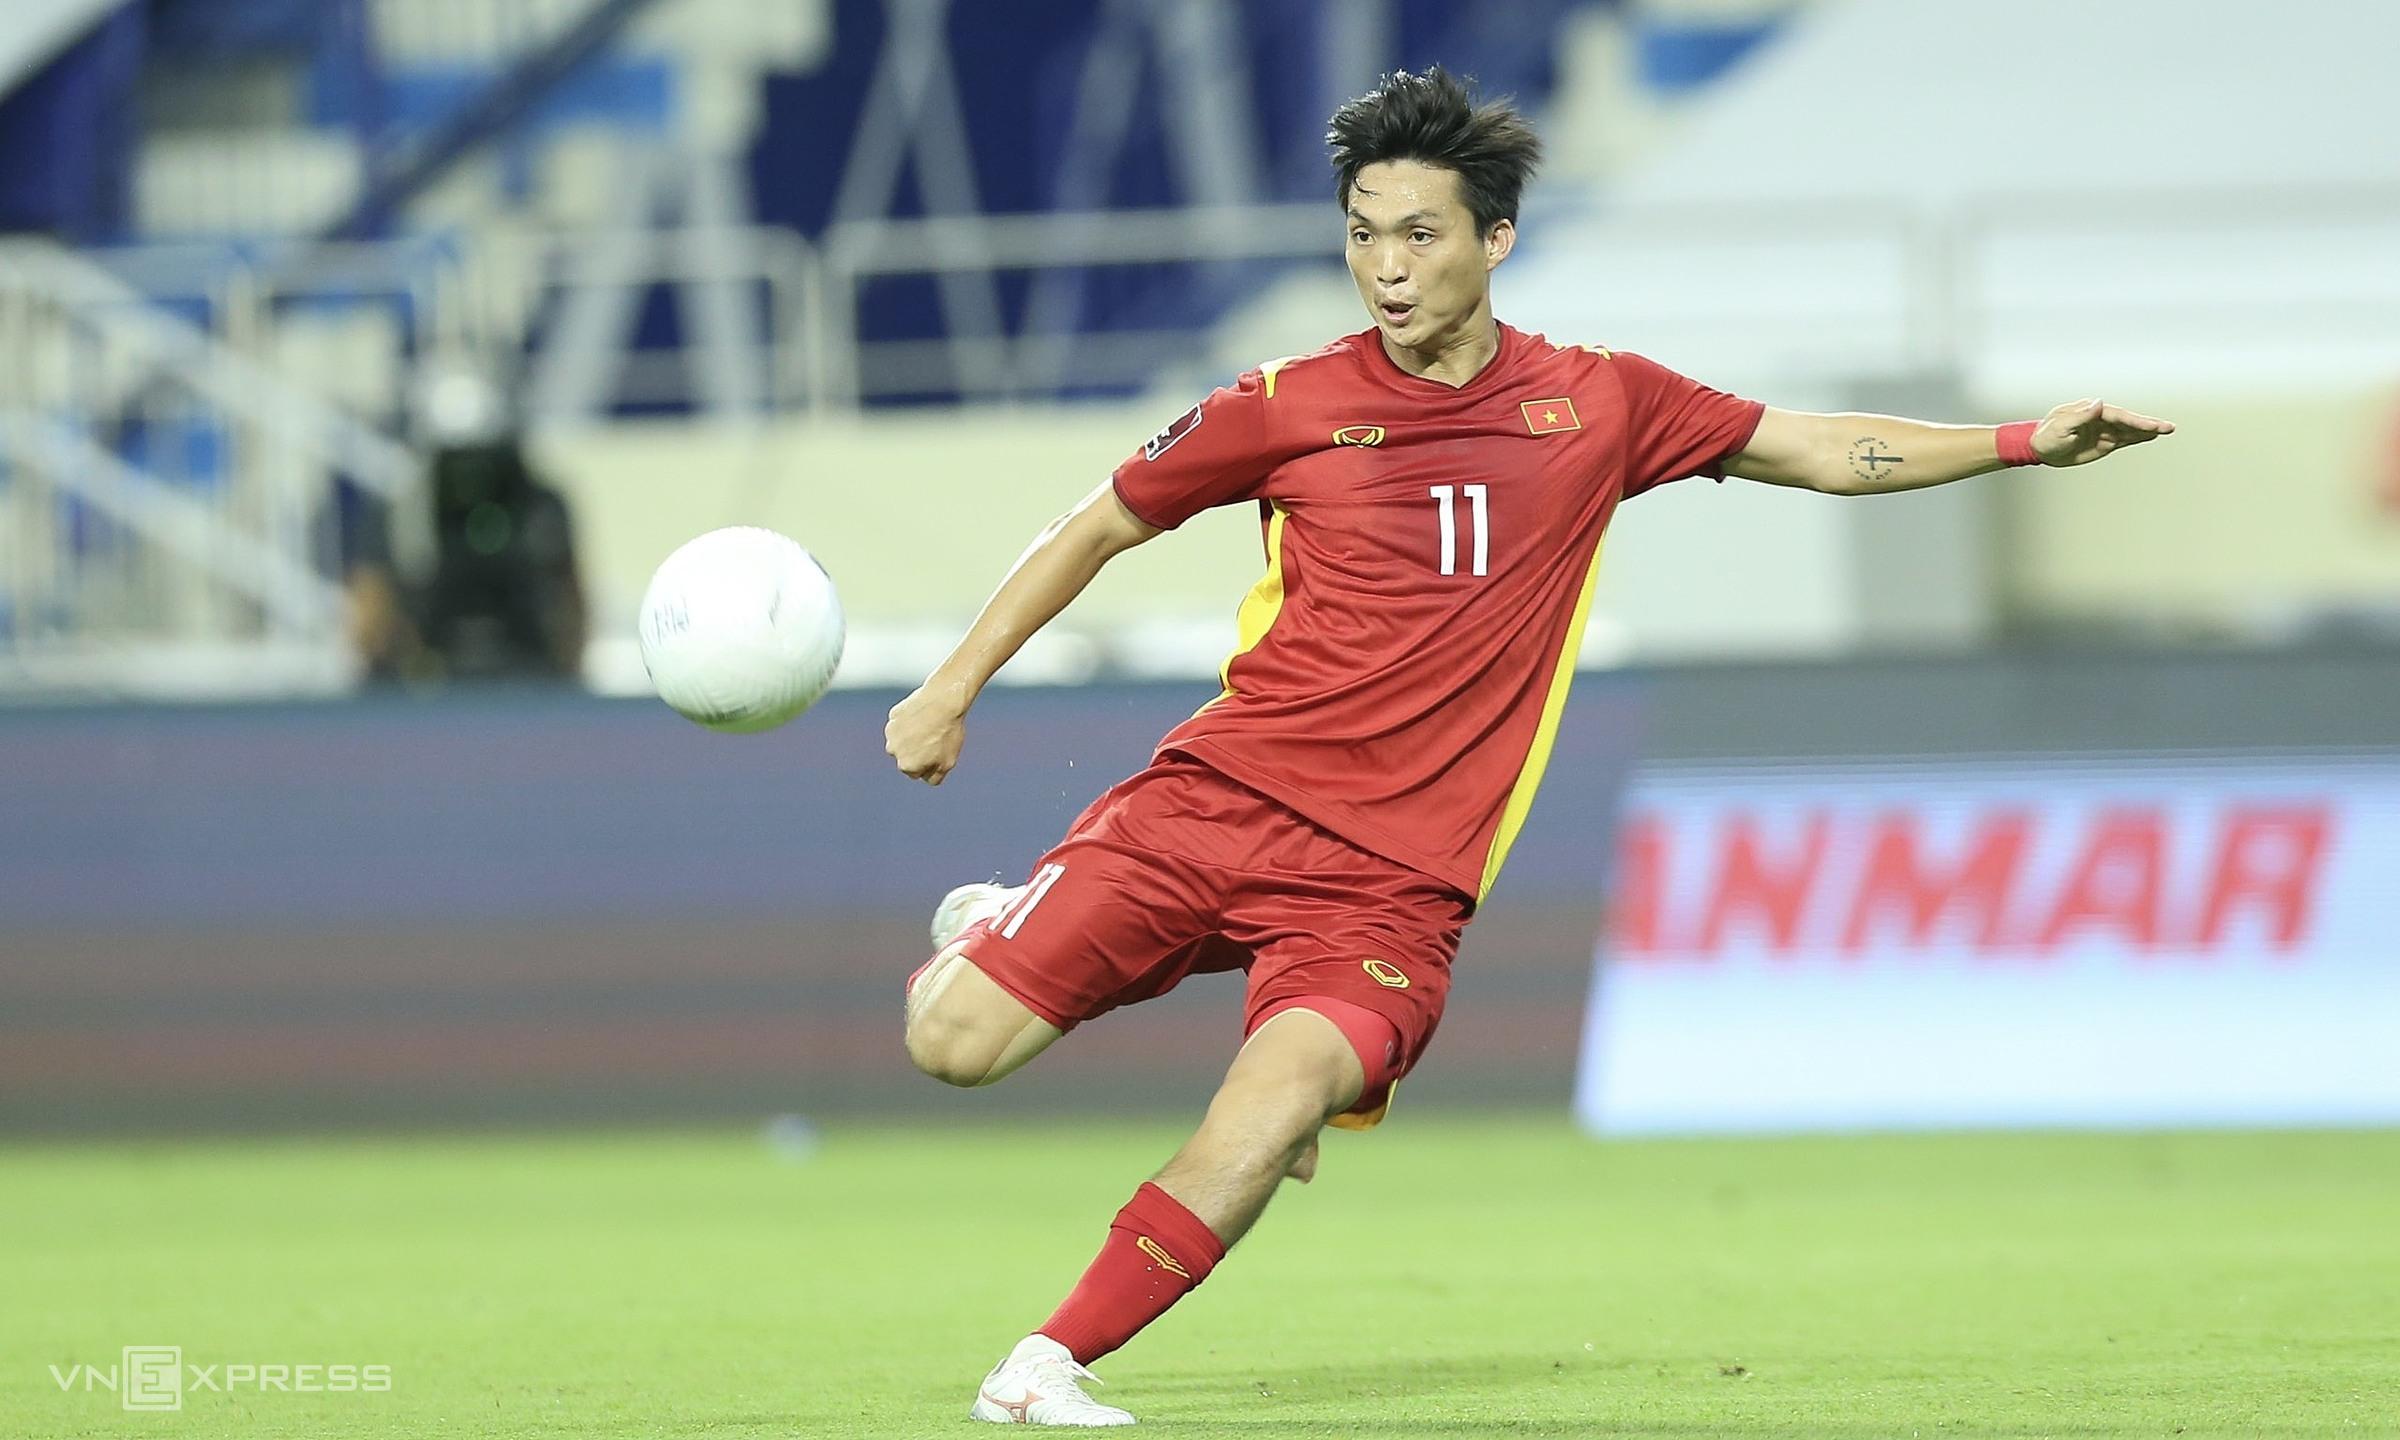 Tuan Anh bermain bagus dalam pertahanan dari jarak jauh dan memberikan kartu, sebelum cedera meninggalkan lapangan.  Foto: Lam Thoa